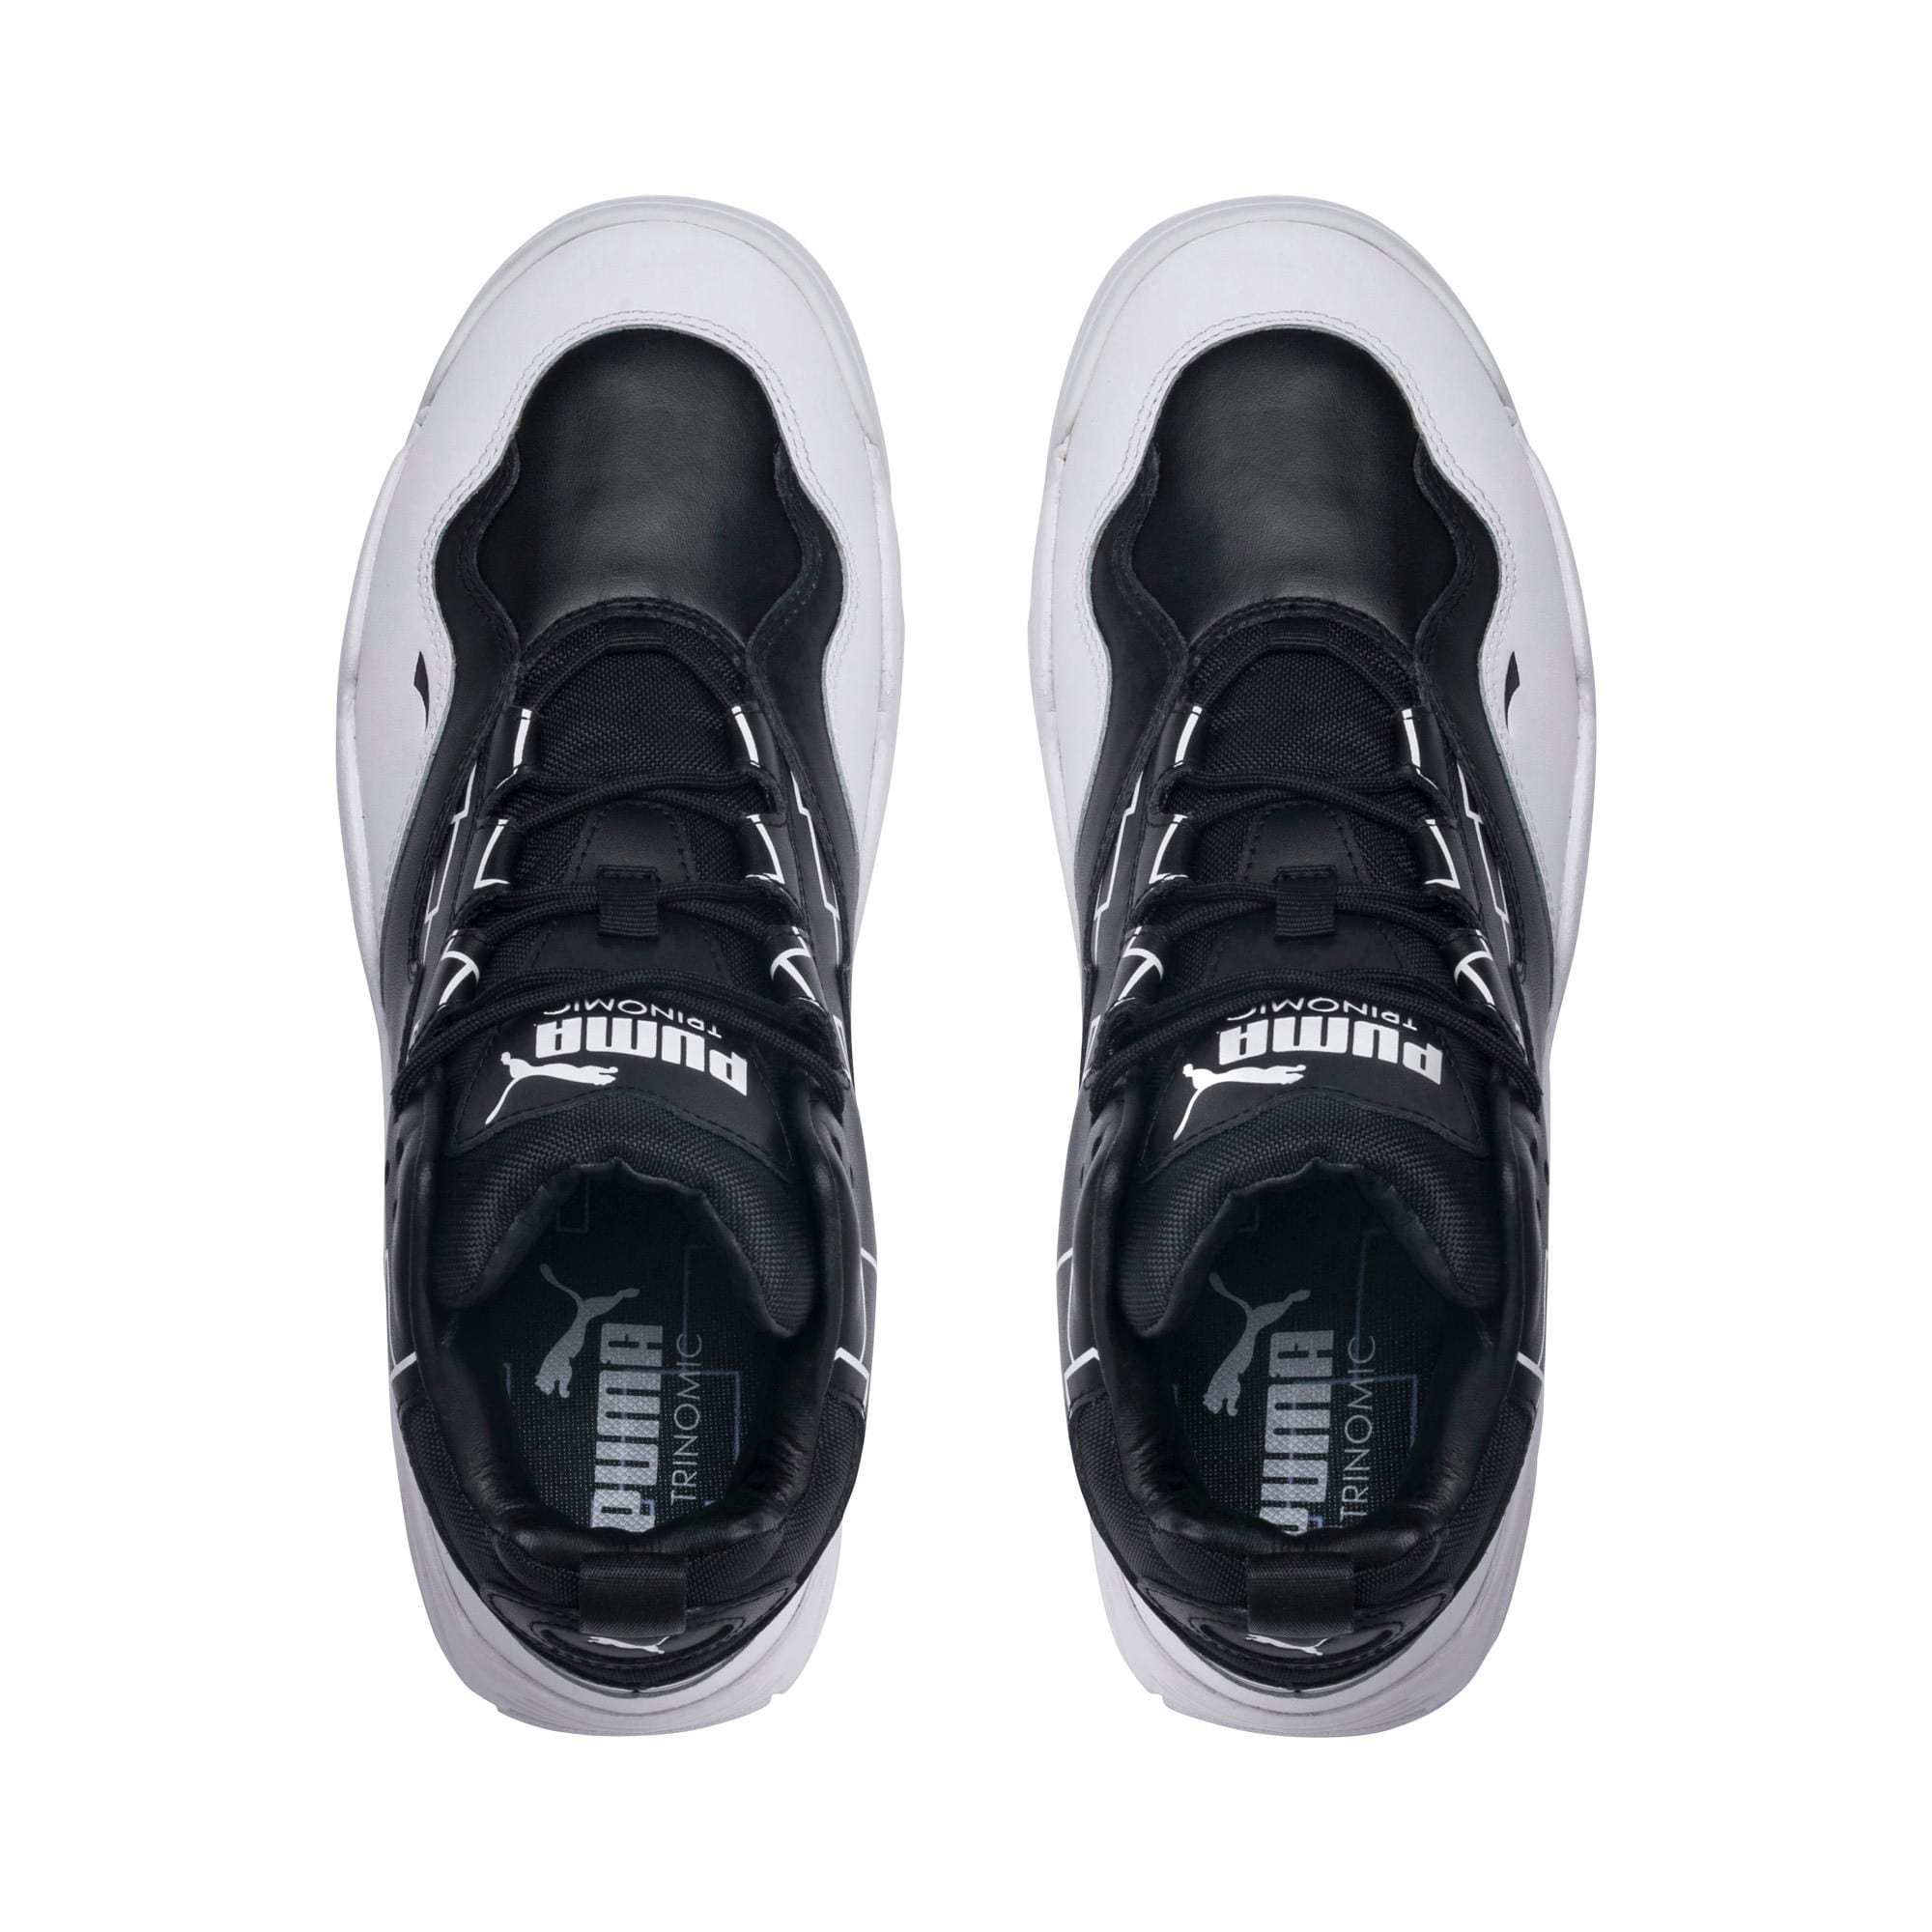 Thumbnail 6 of Source Mid Bracket Sneakers, Puma Black-Puma White, medium